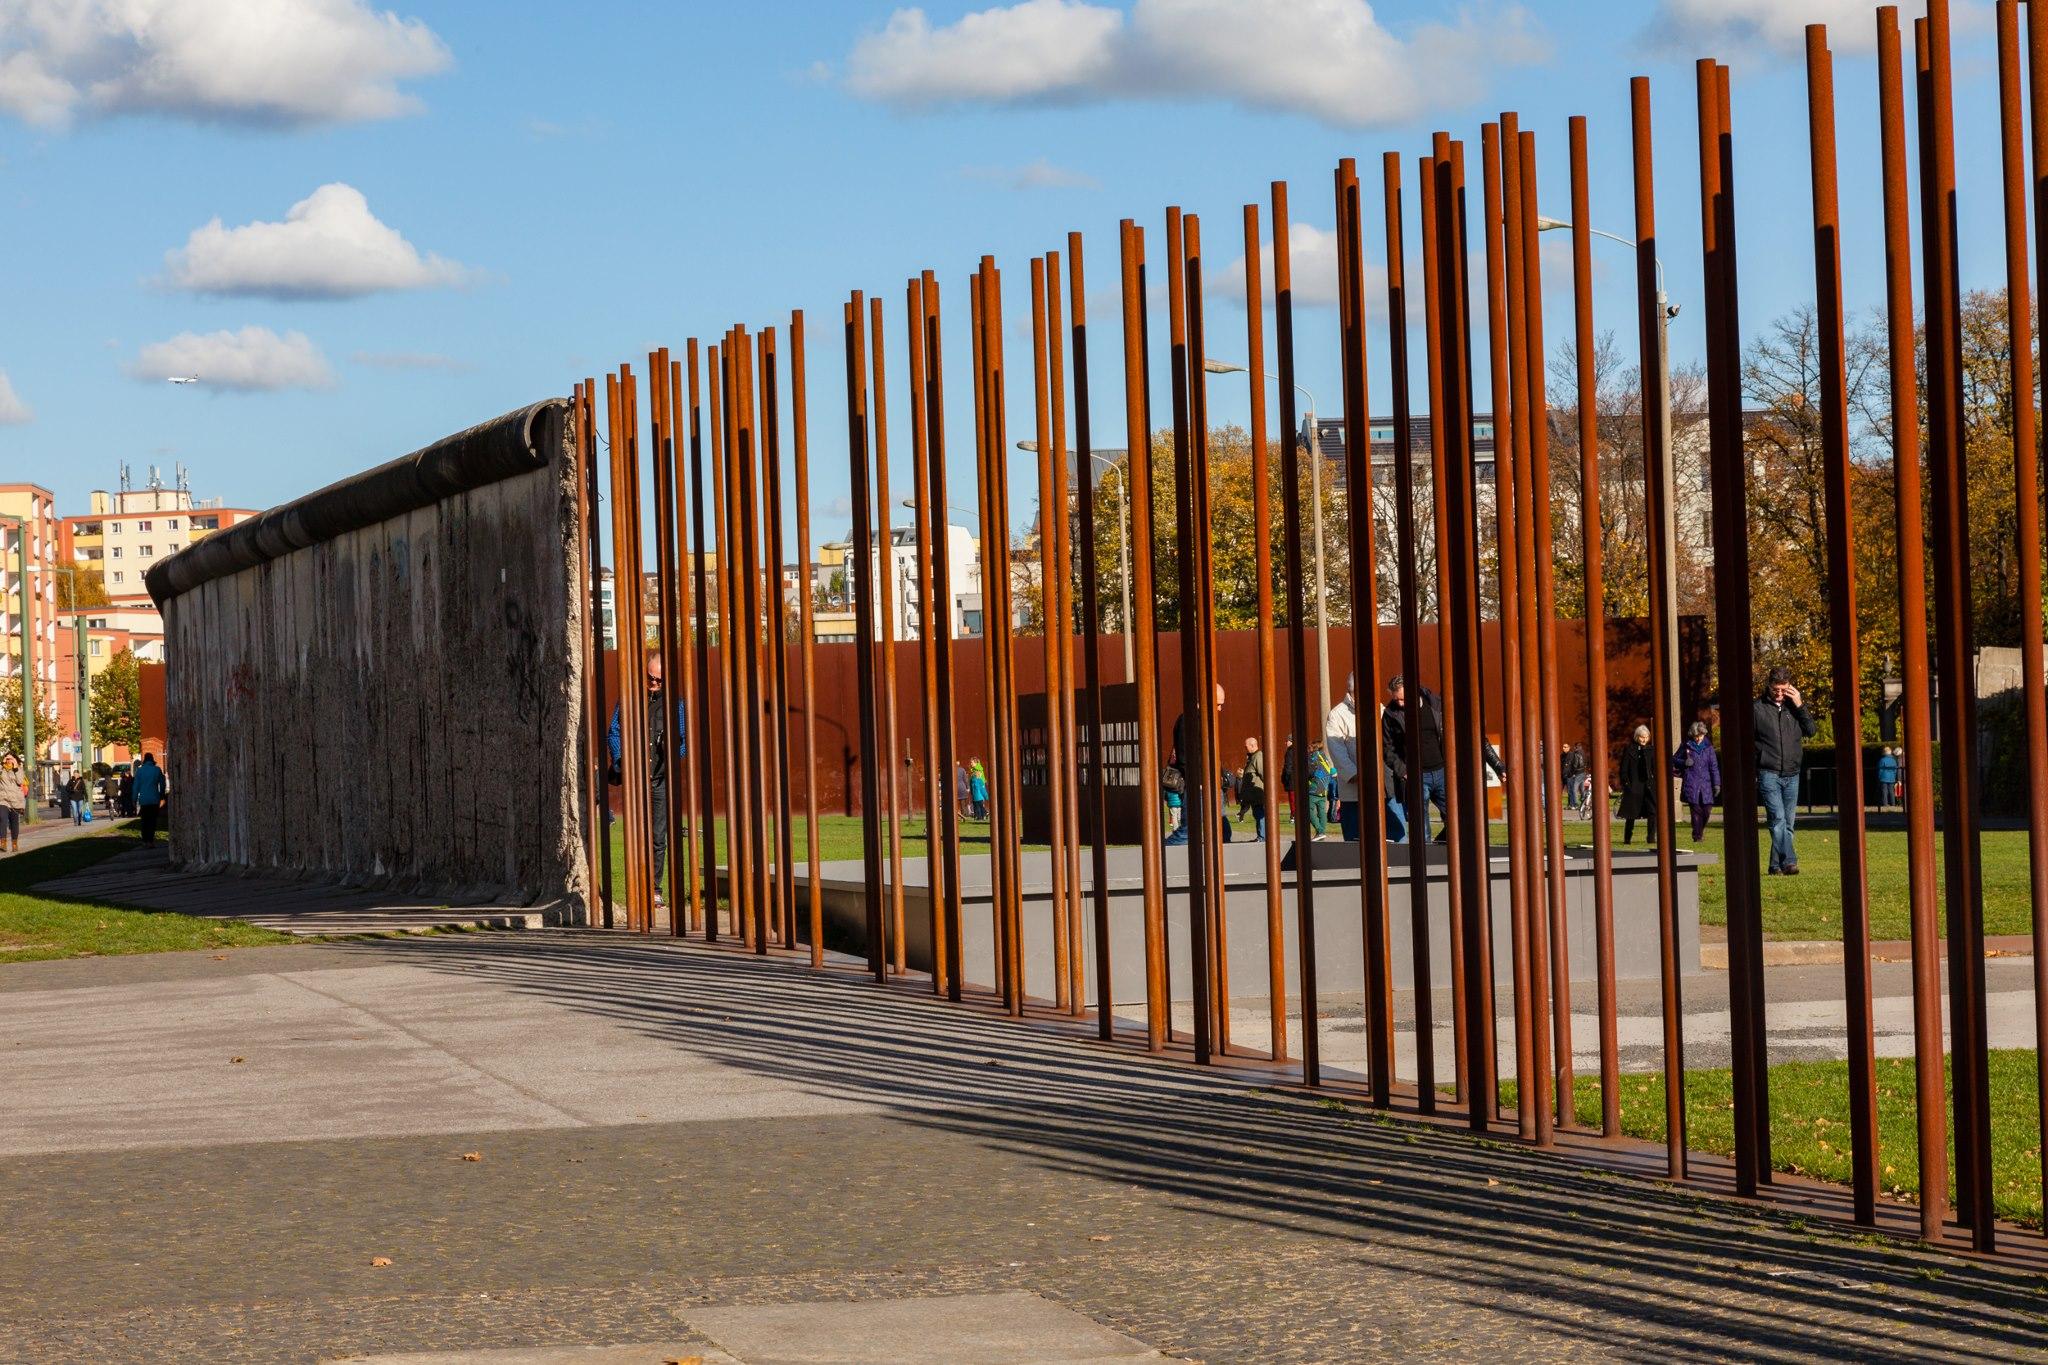 Foto via: https://www.facebook.com/Stiftung.Berliner.Mauer/photos/a.10150682159684674/10151454772744674/?type=3&theater